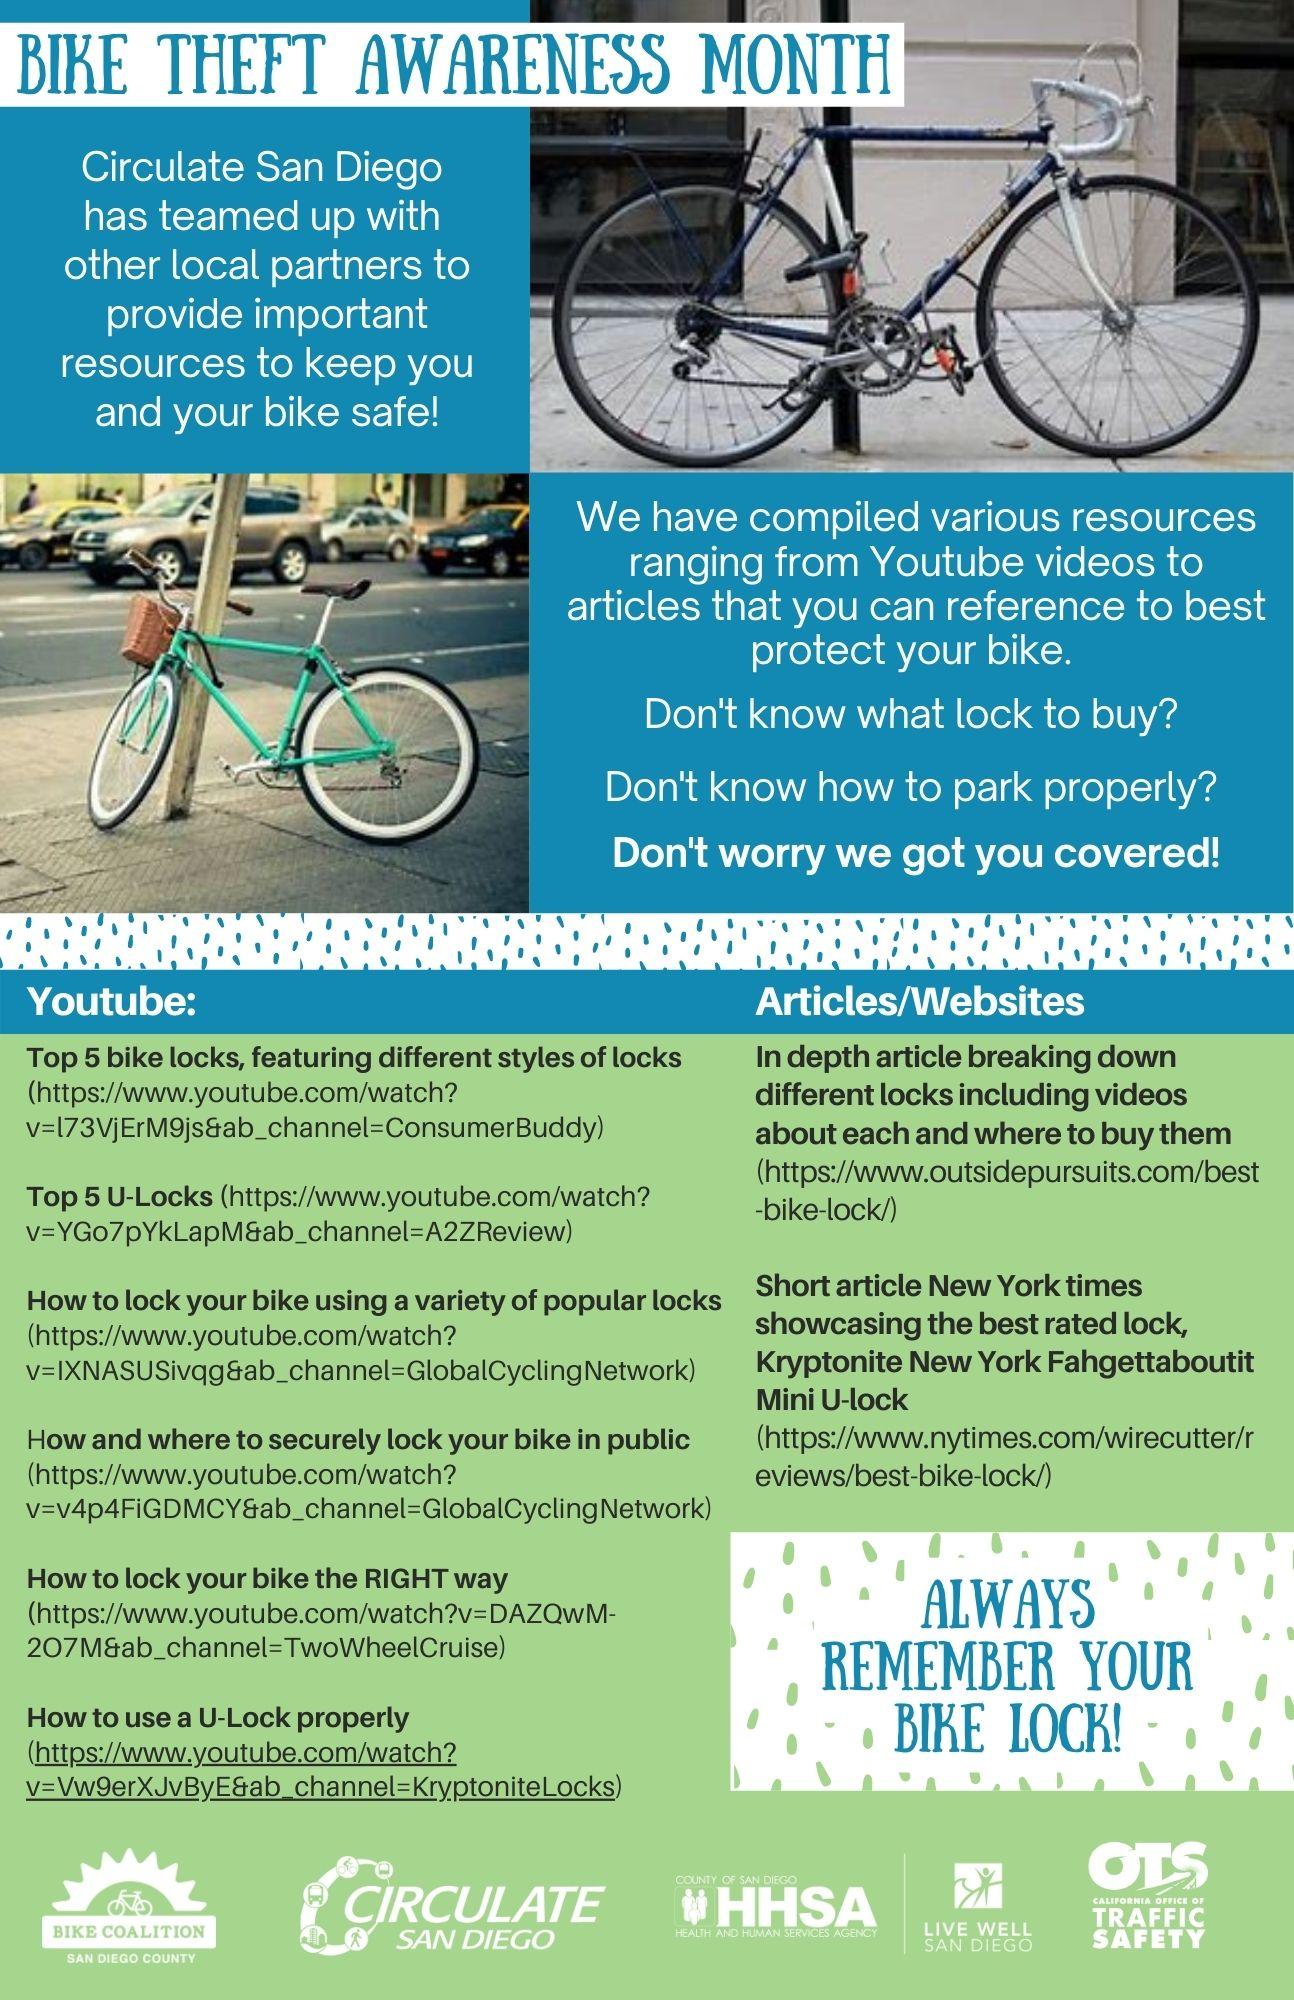 Bike_Theft_Awareness_Month_flyer.jpg